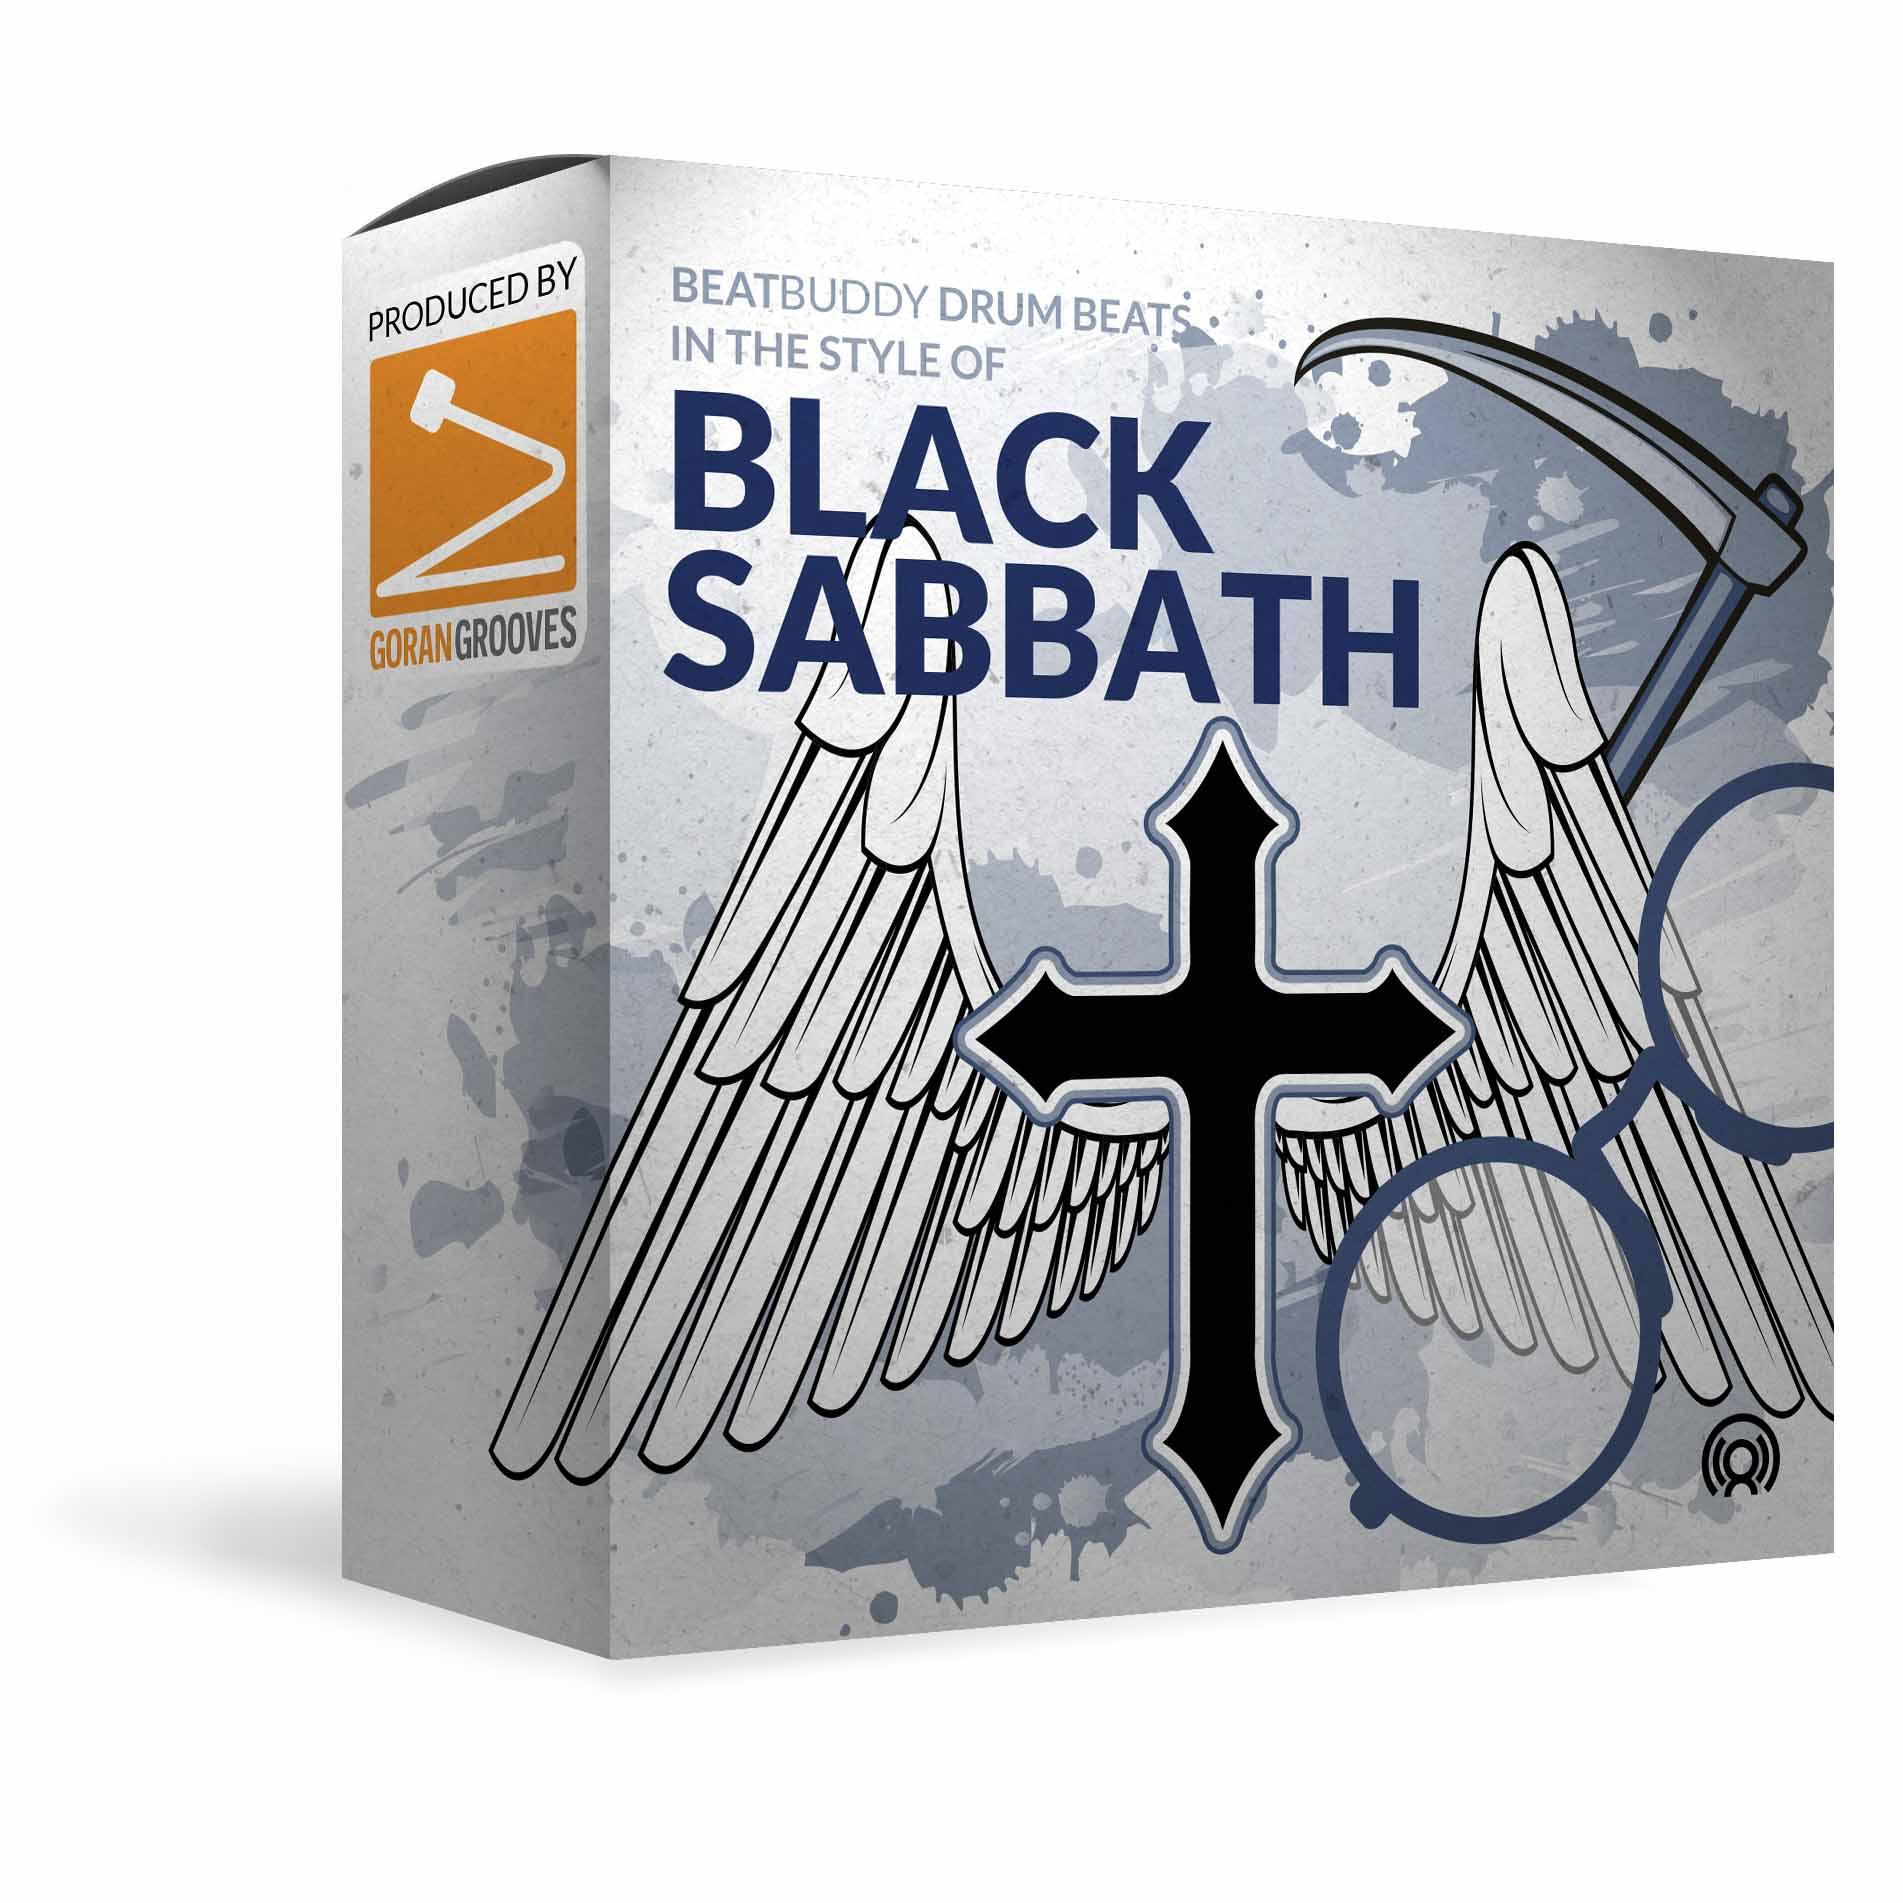 Black sabbath Iron Man singiel